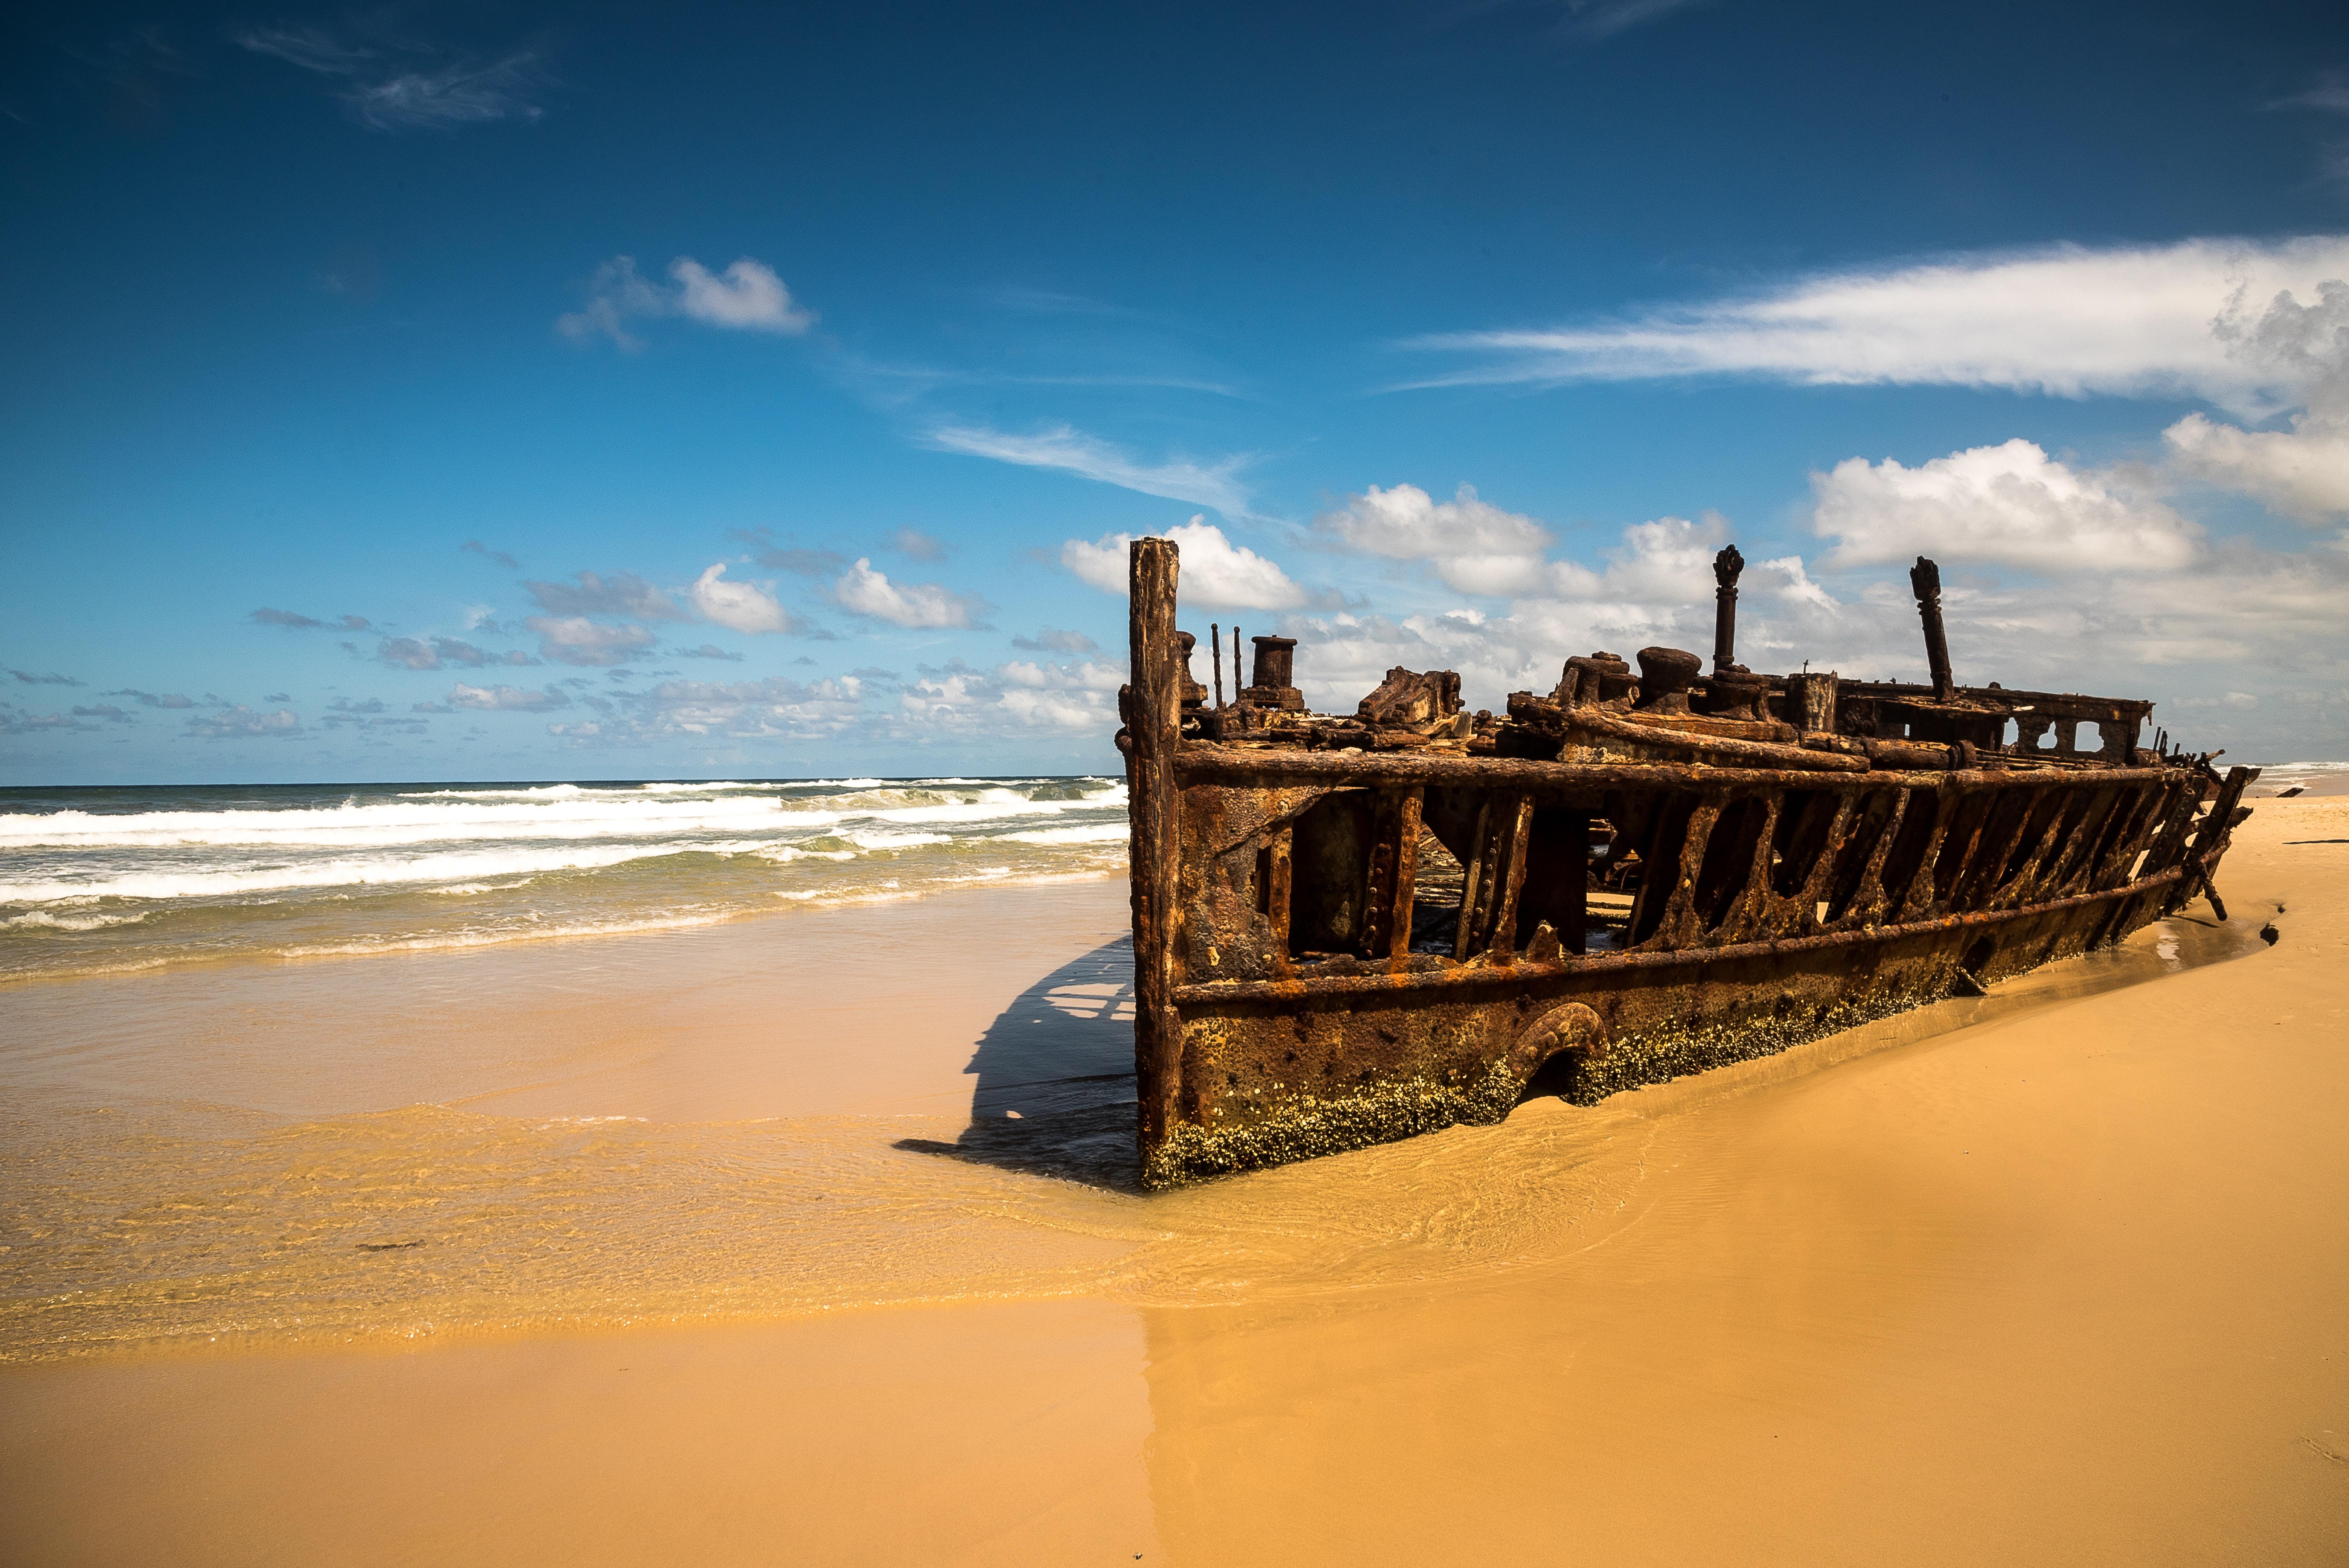 Rotten Maheno shipwreck at the sand beach